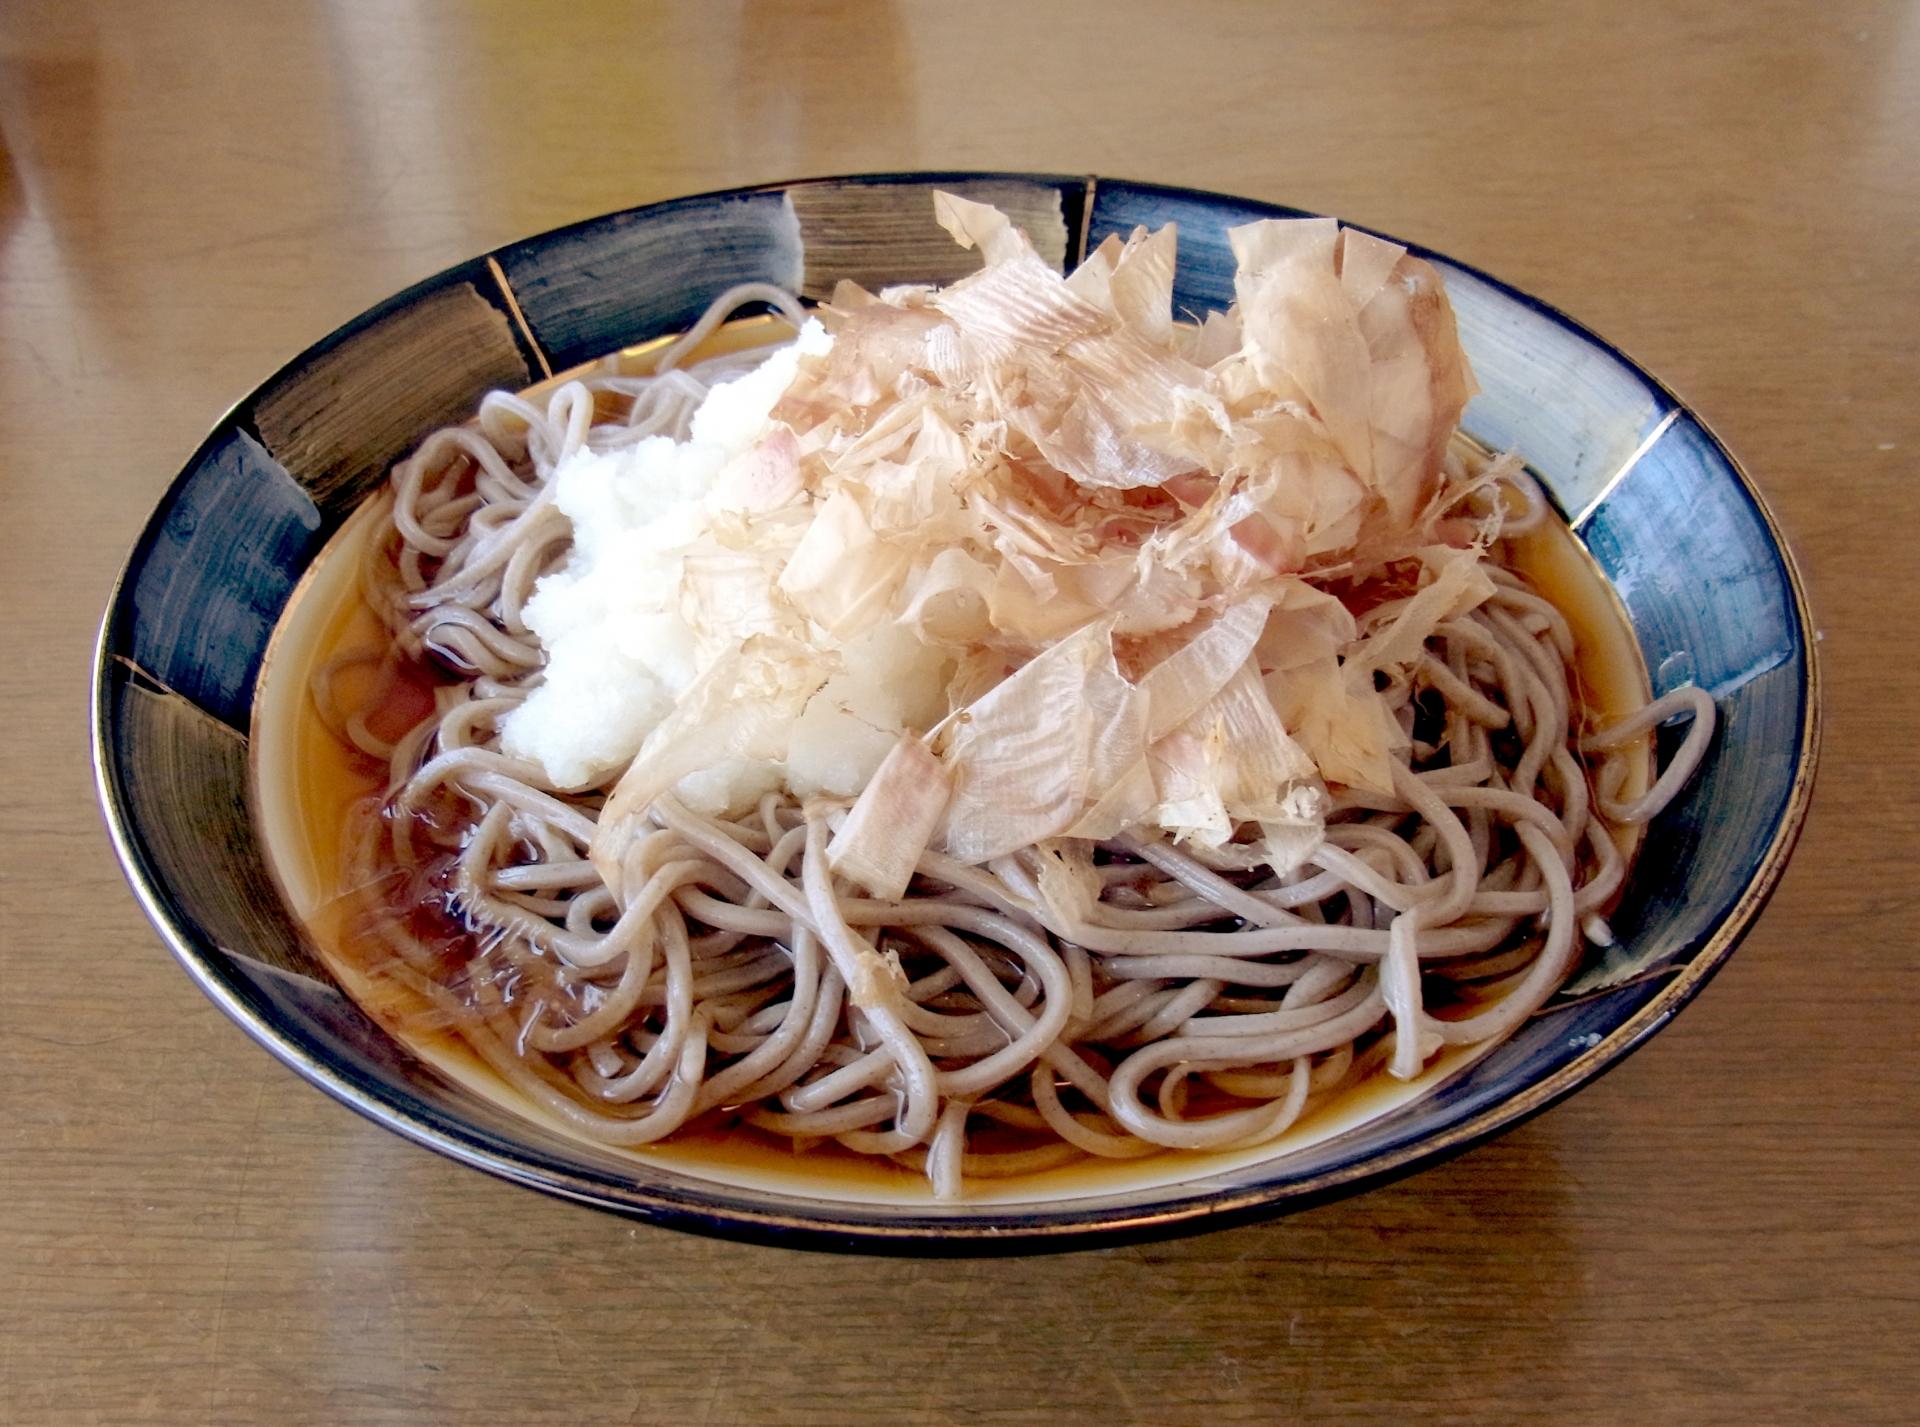 fukui-soba-echizen-oroshi